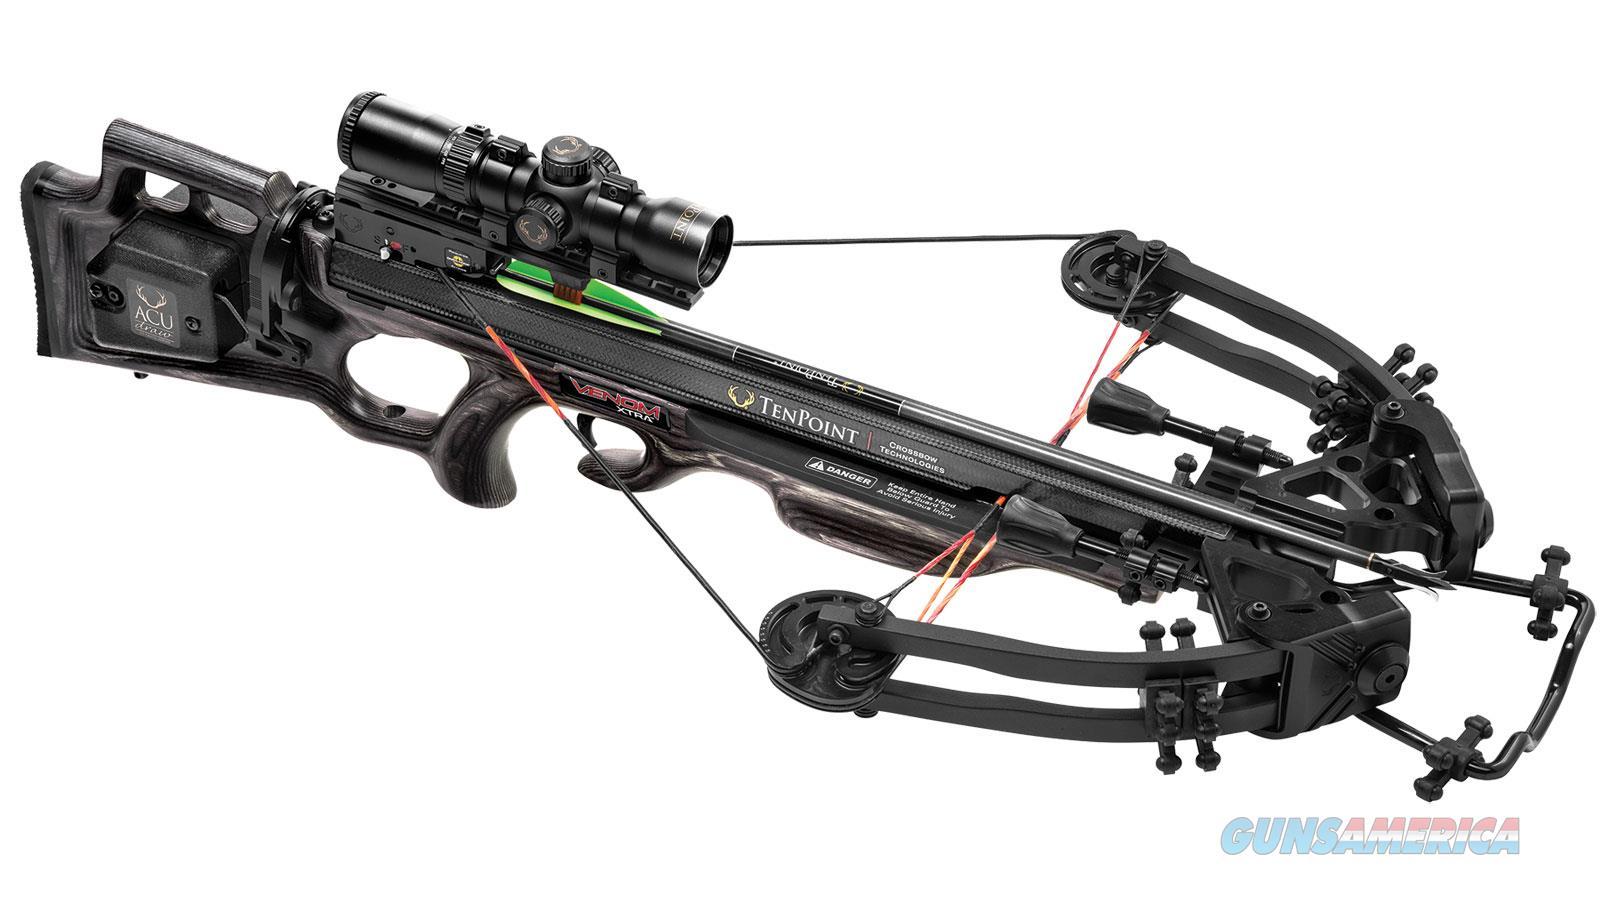 Ten Point Venom Xtra Pkg Range Master CB16001-8412  Non-Guns > Archery > Bows > Crossbows